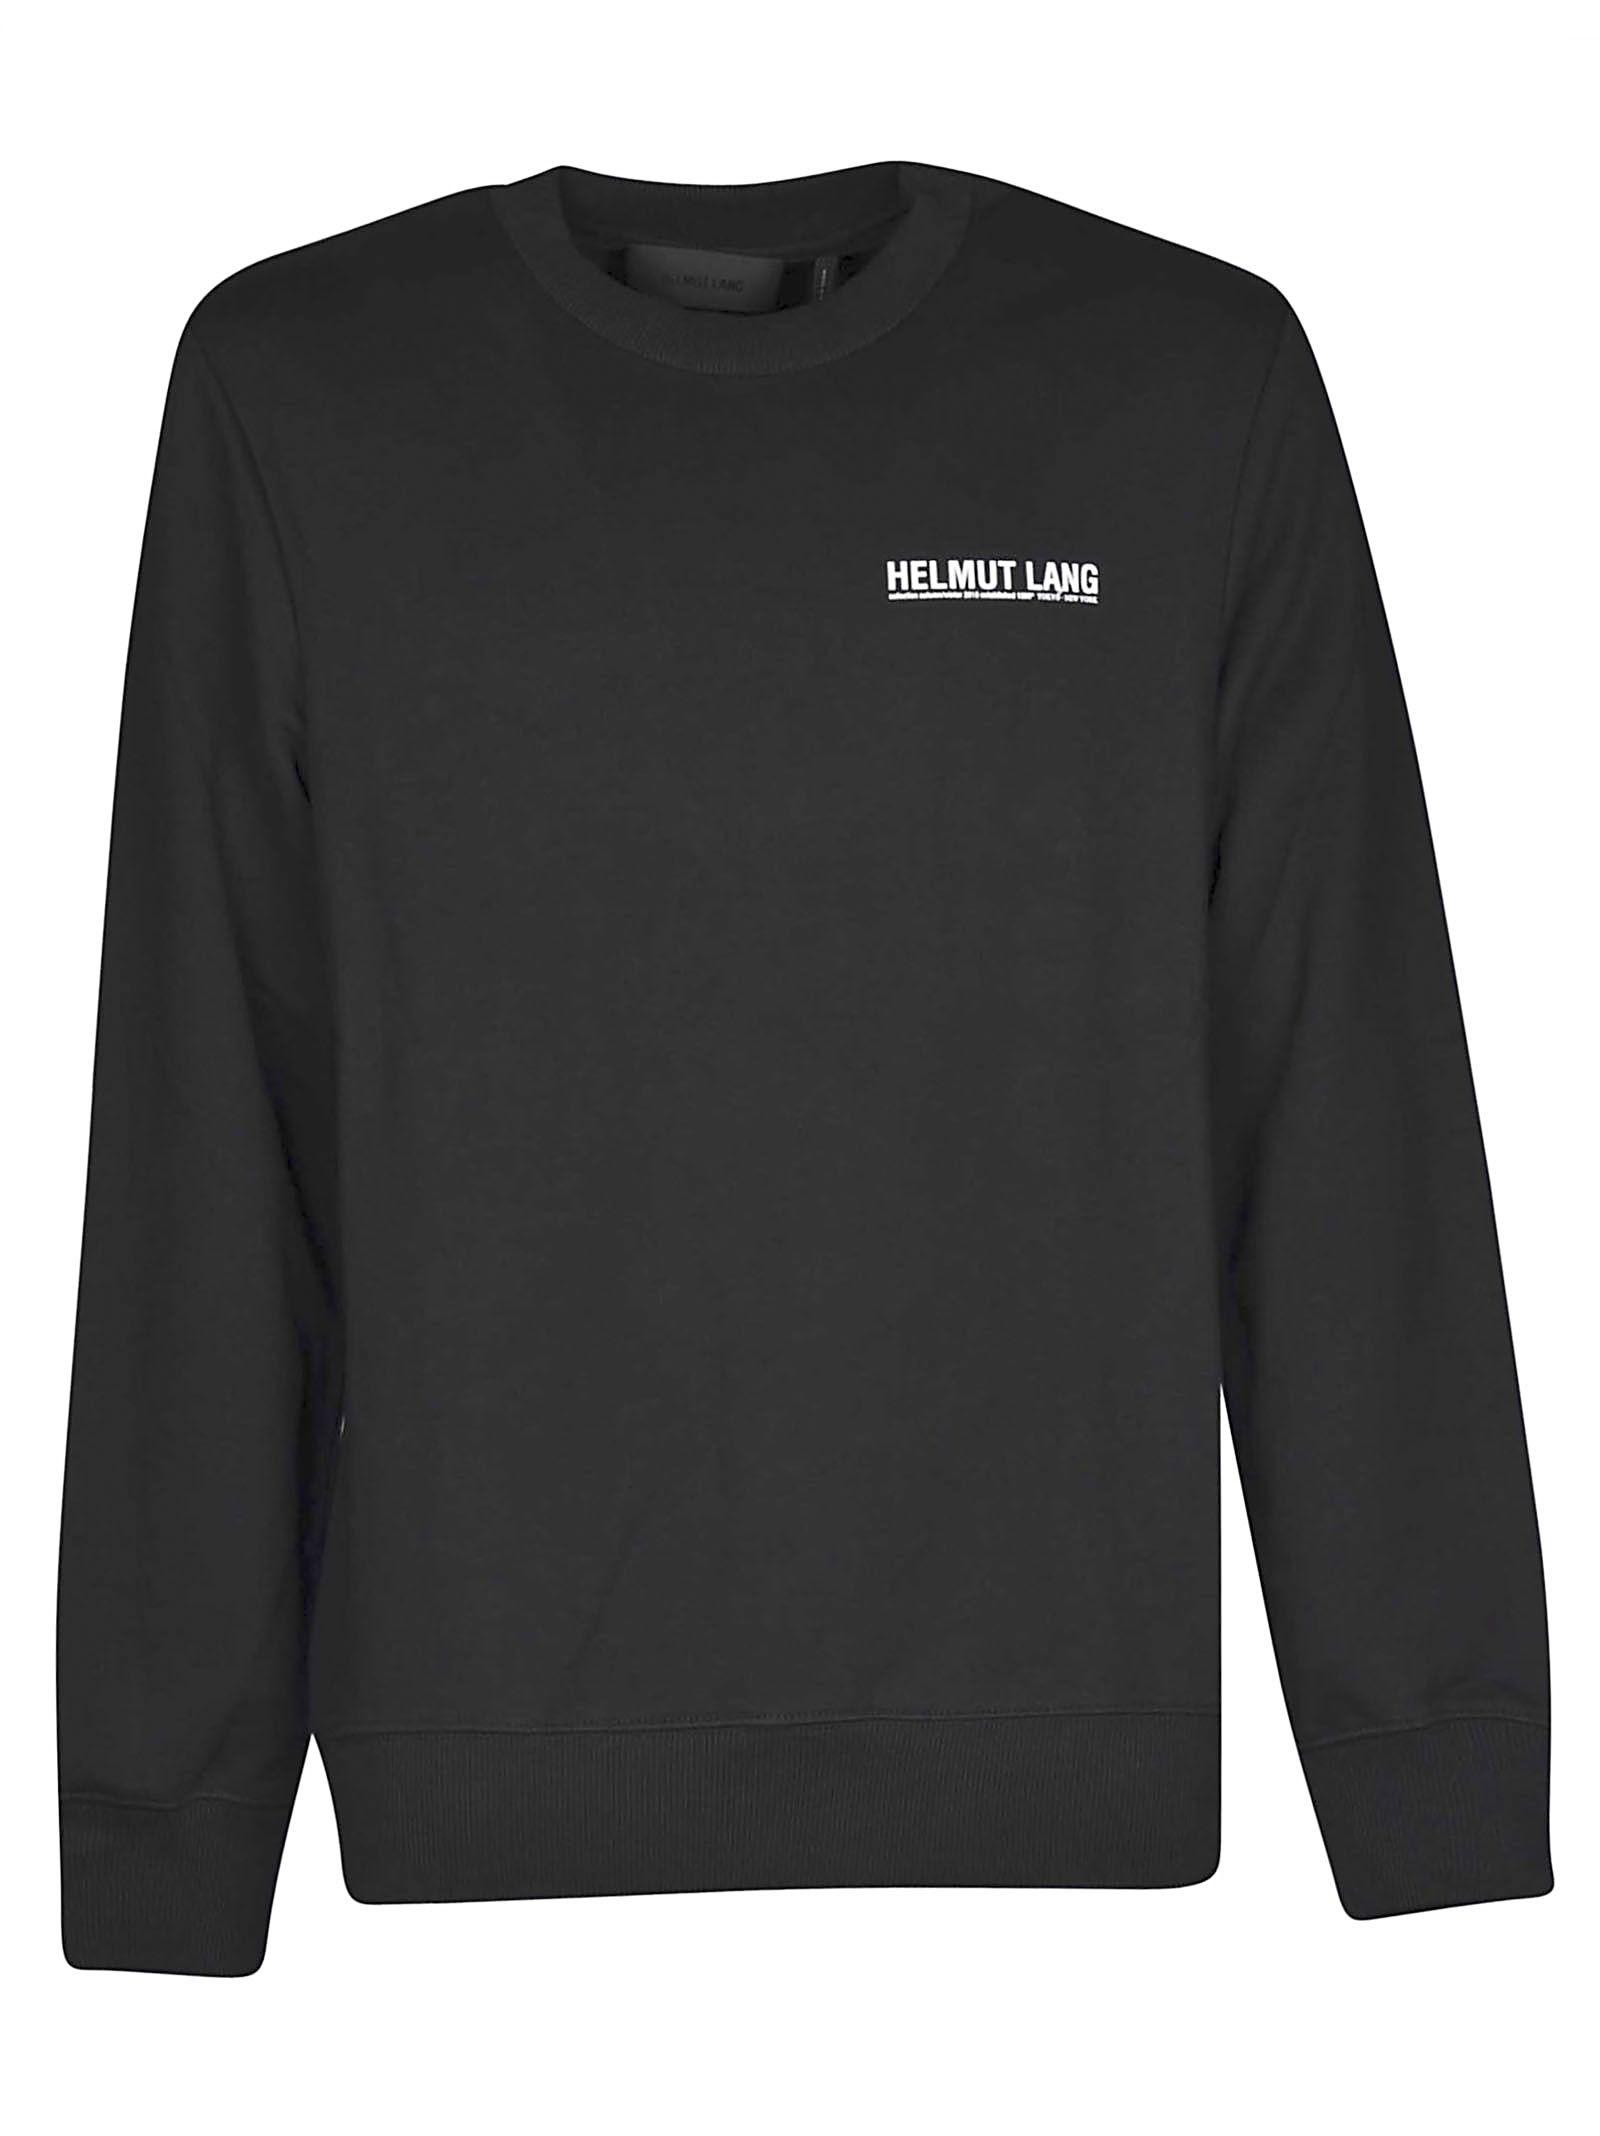 Helmut Lang Logo Sweatshirt